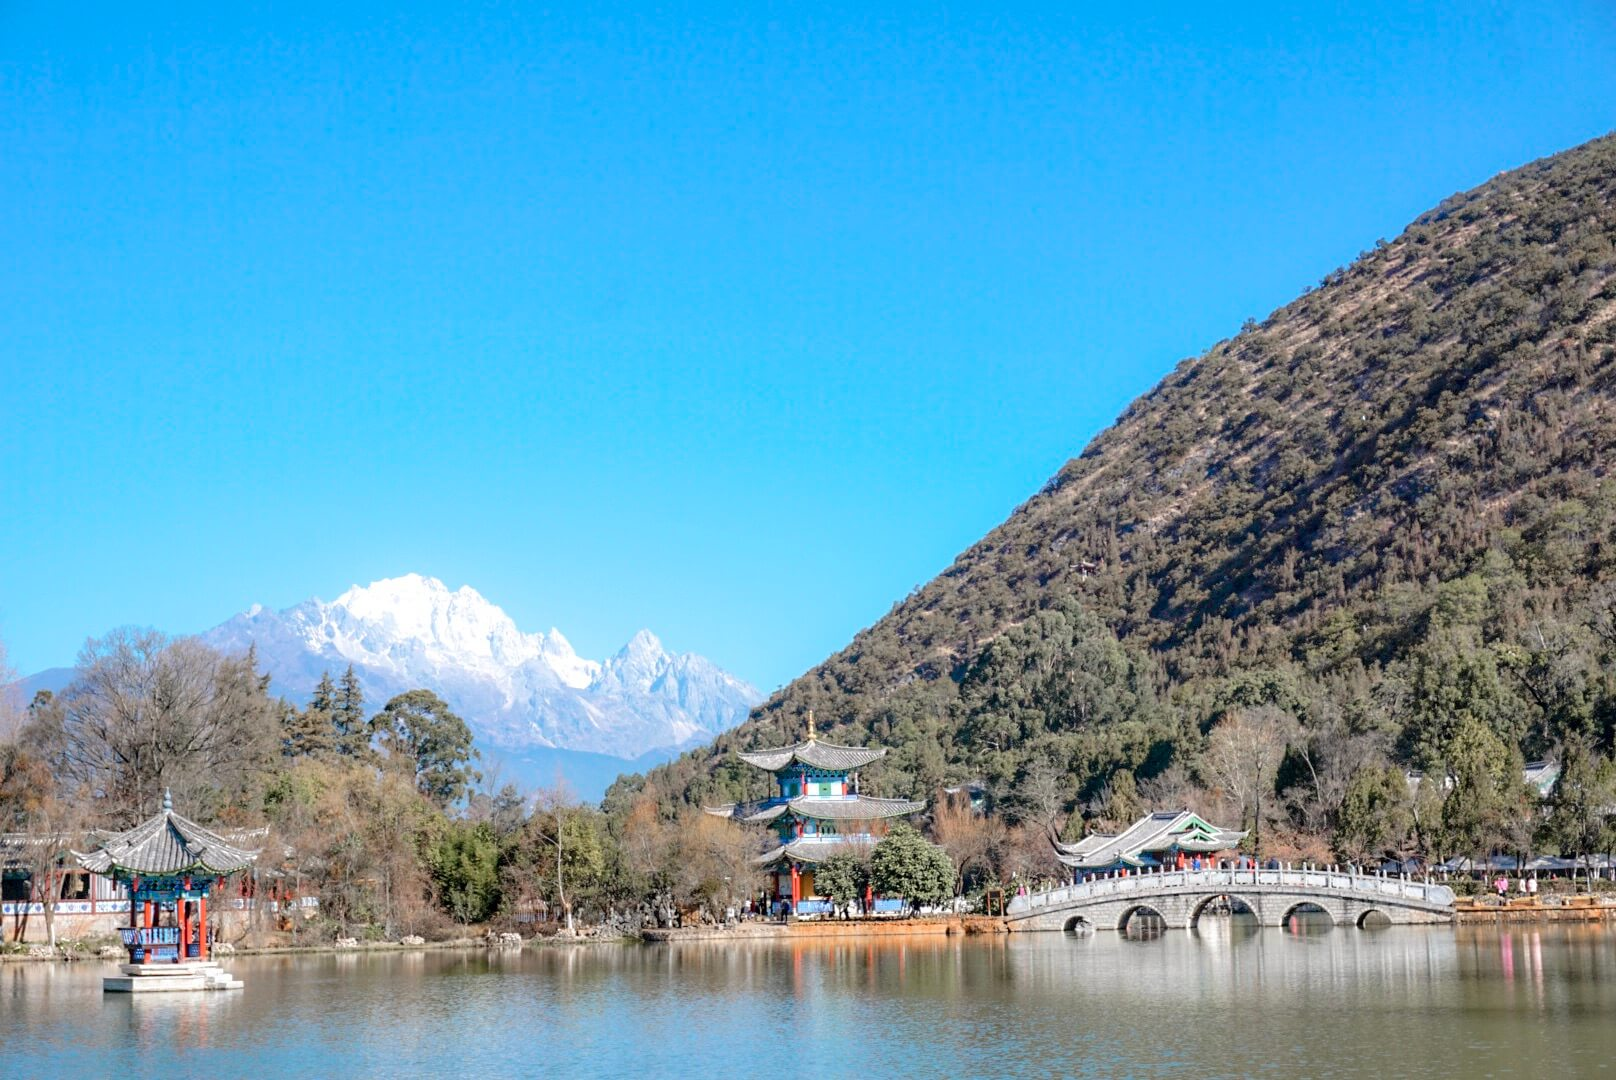 Lijiang black dragon pool vue sur montagne du dragon de jade chine